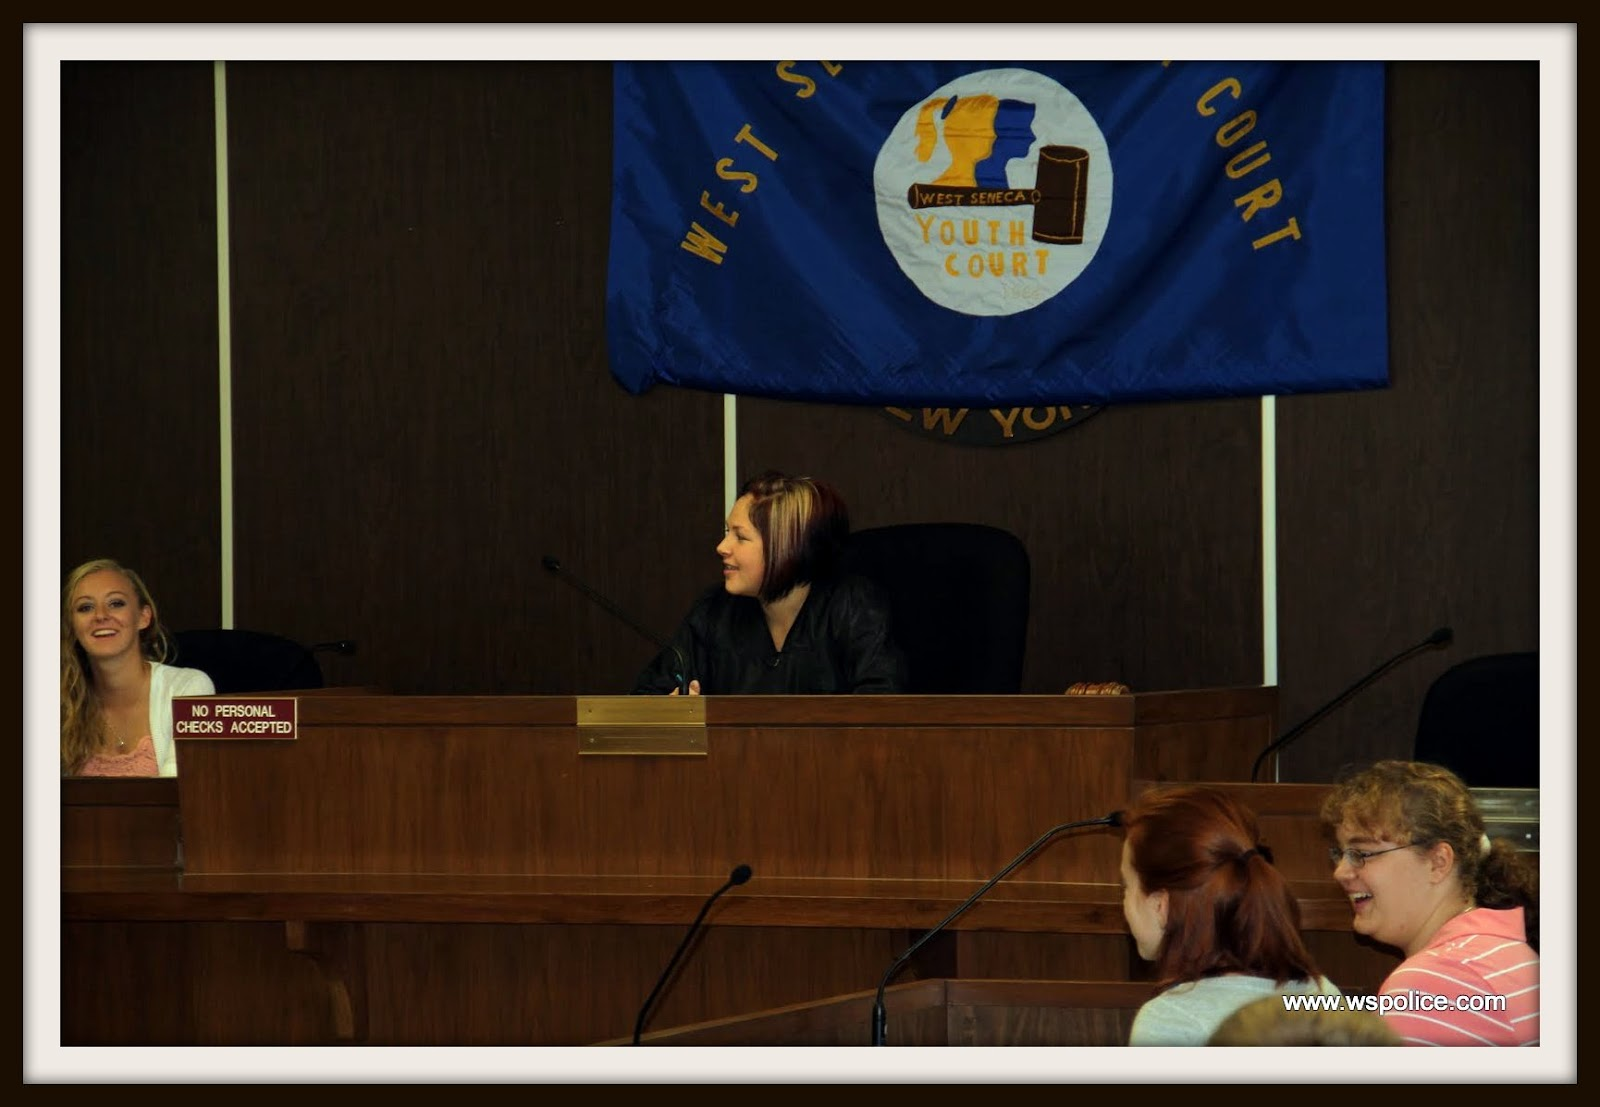 County teen court serves 1